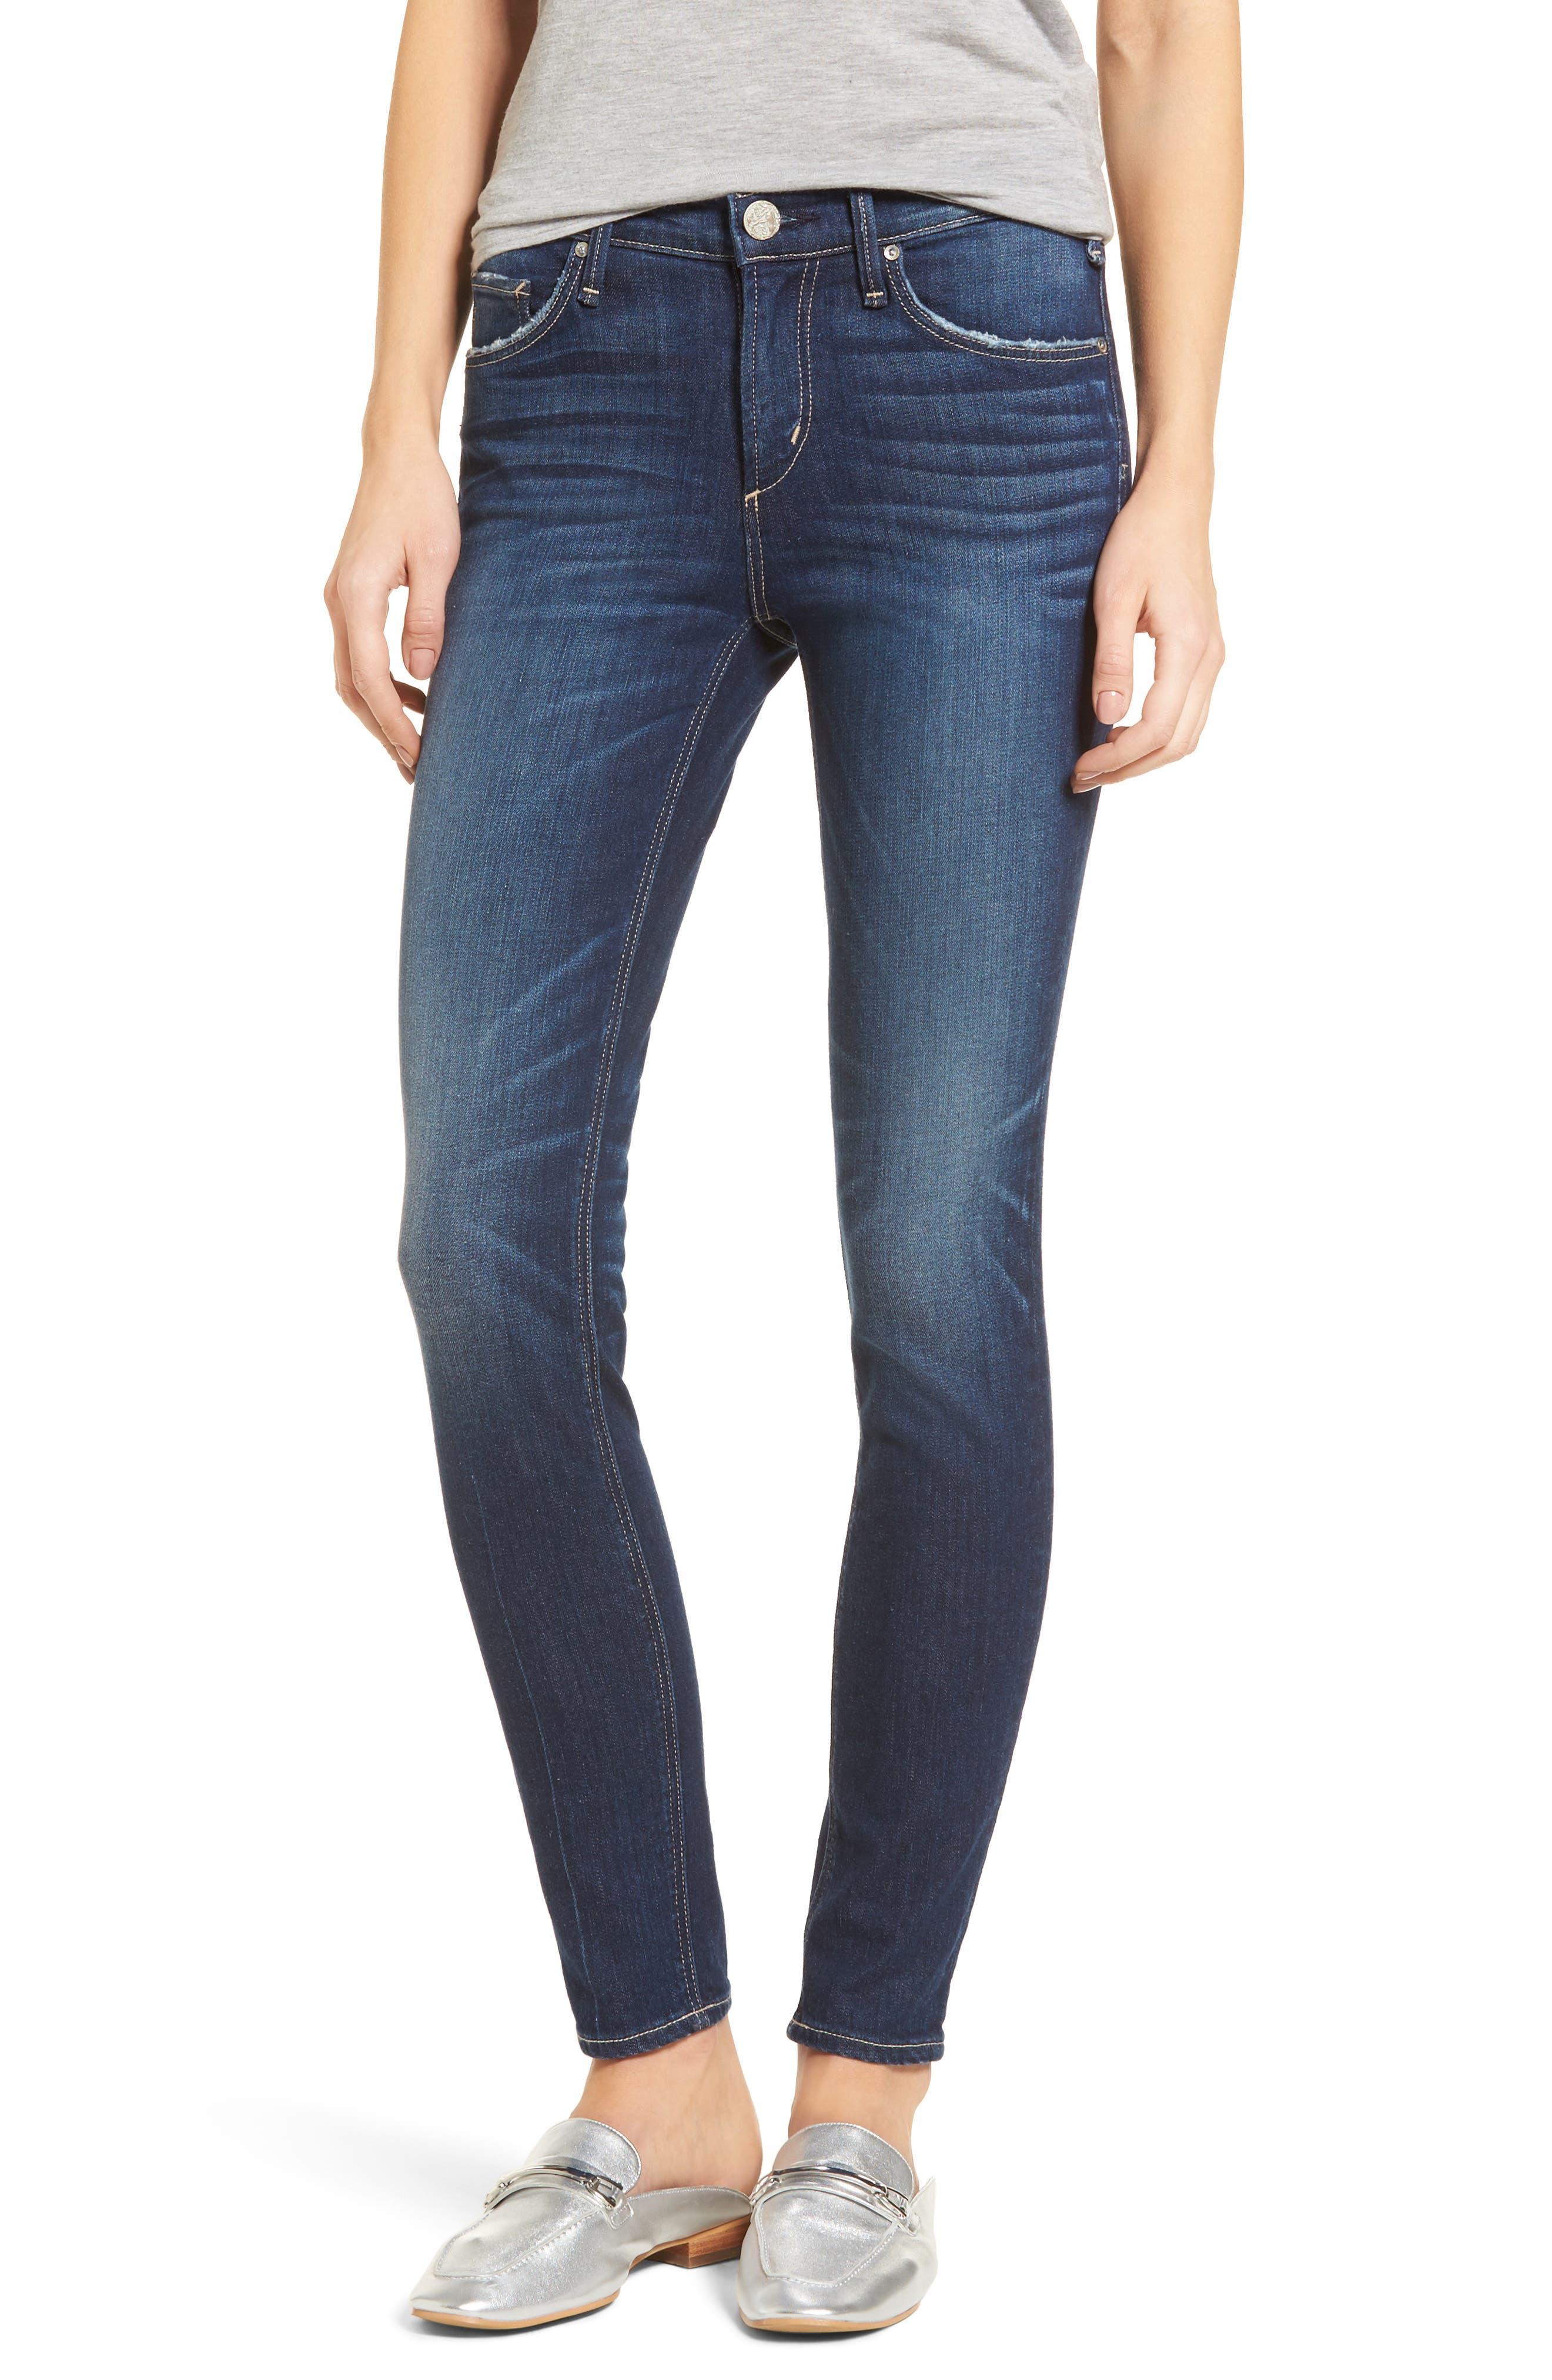 Newton Skinny Jeans,                             Main thumbnail 1, color,                             429